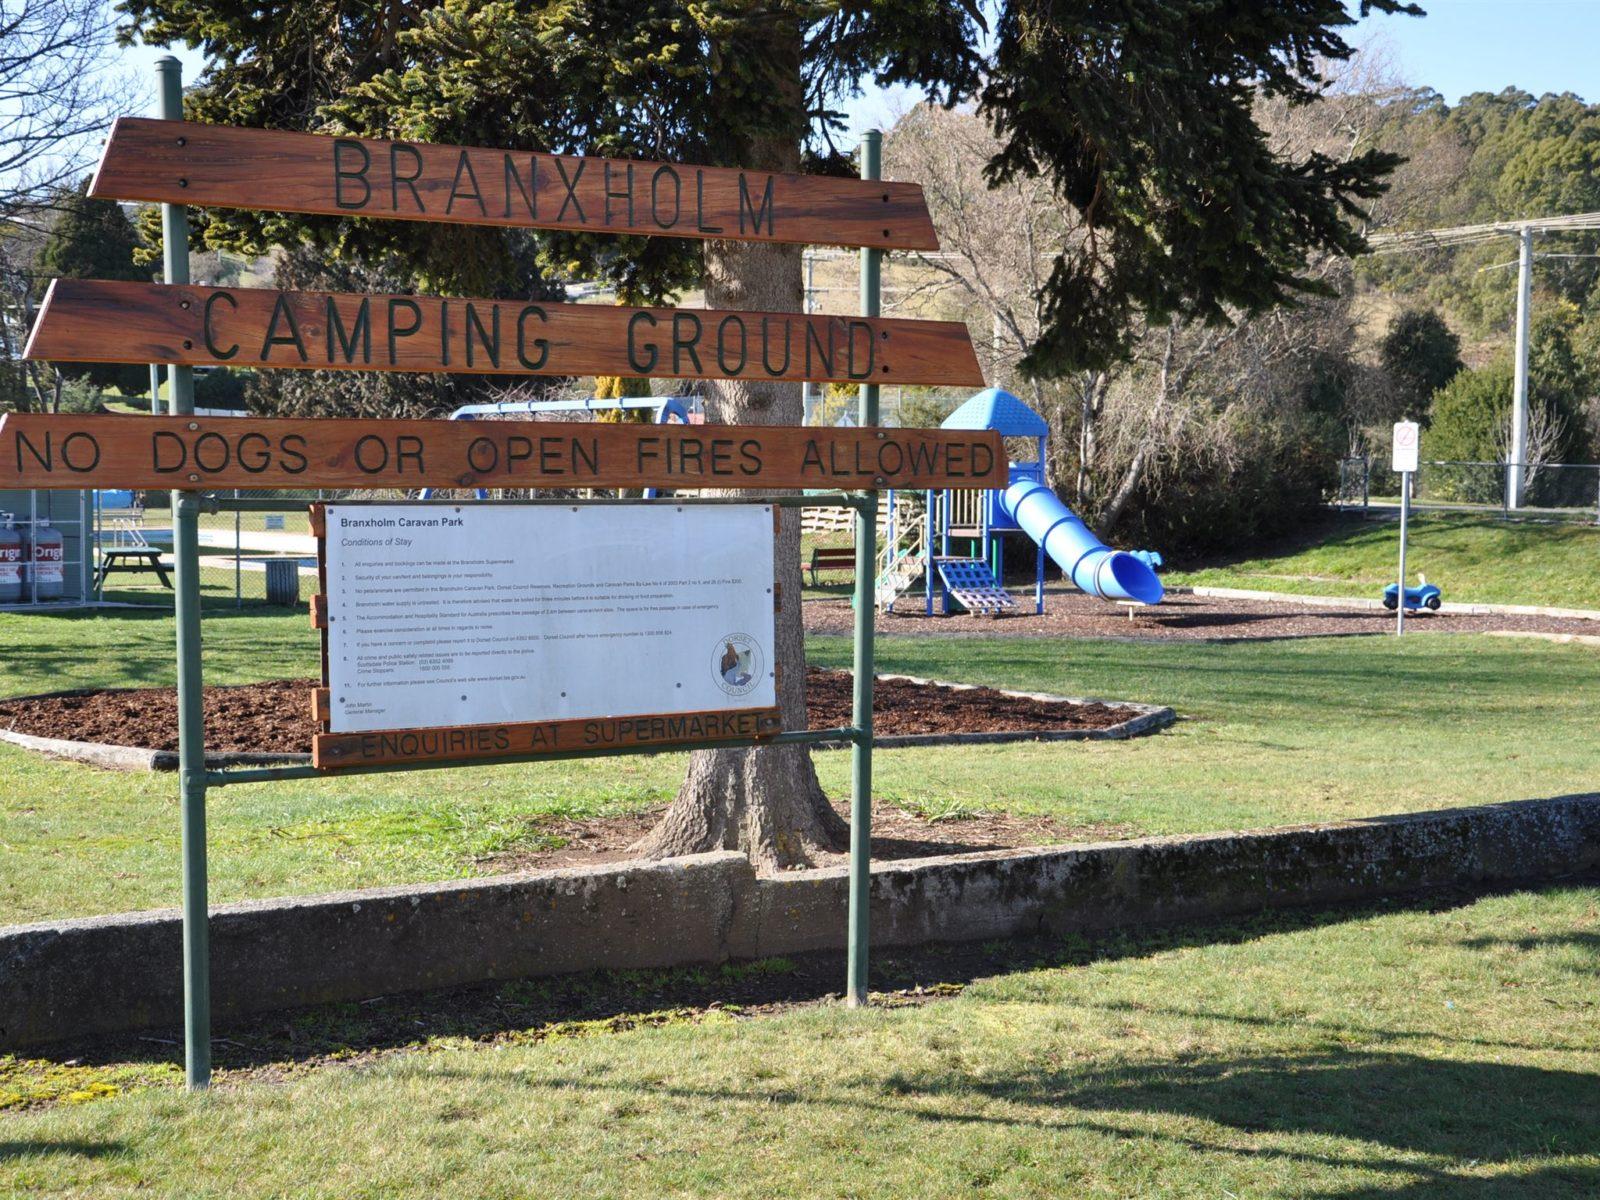 Branxholm Camping Ground Childrens Playground